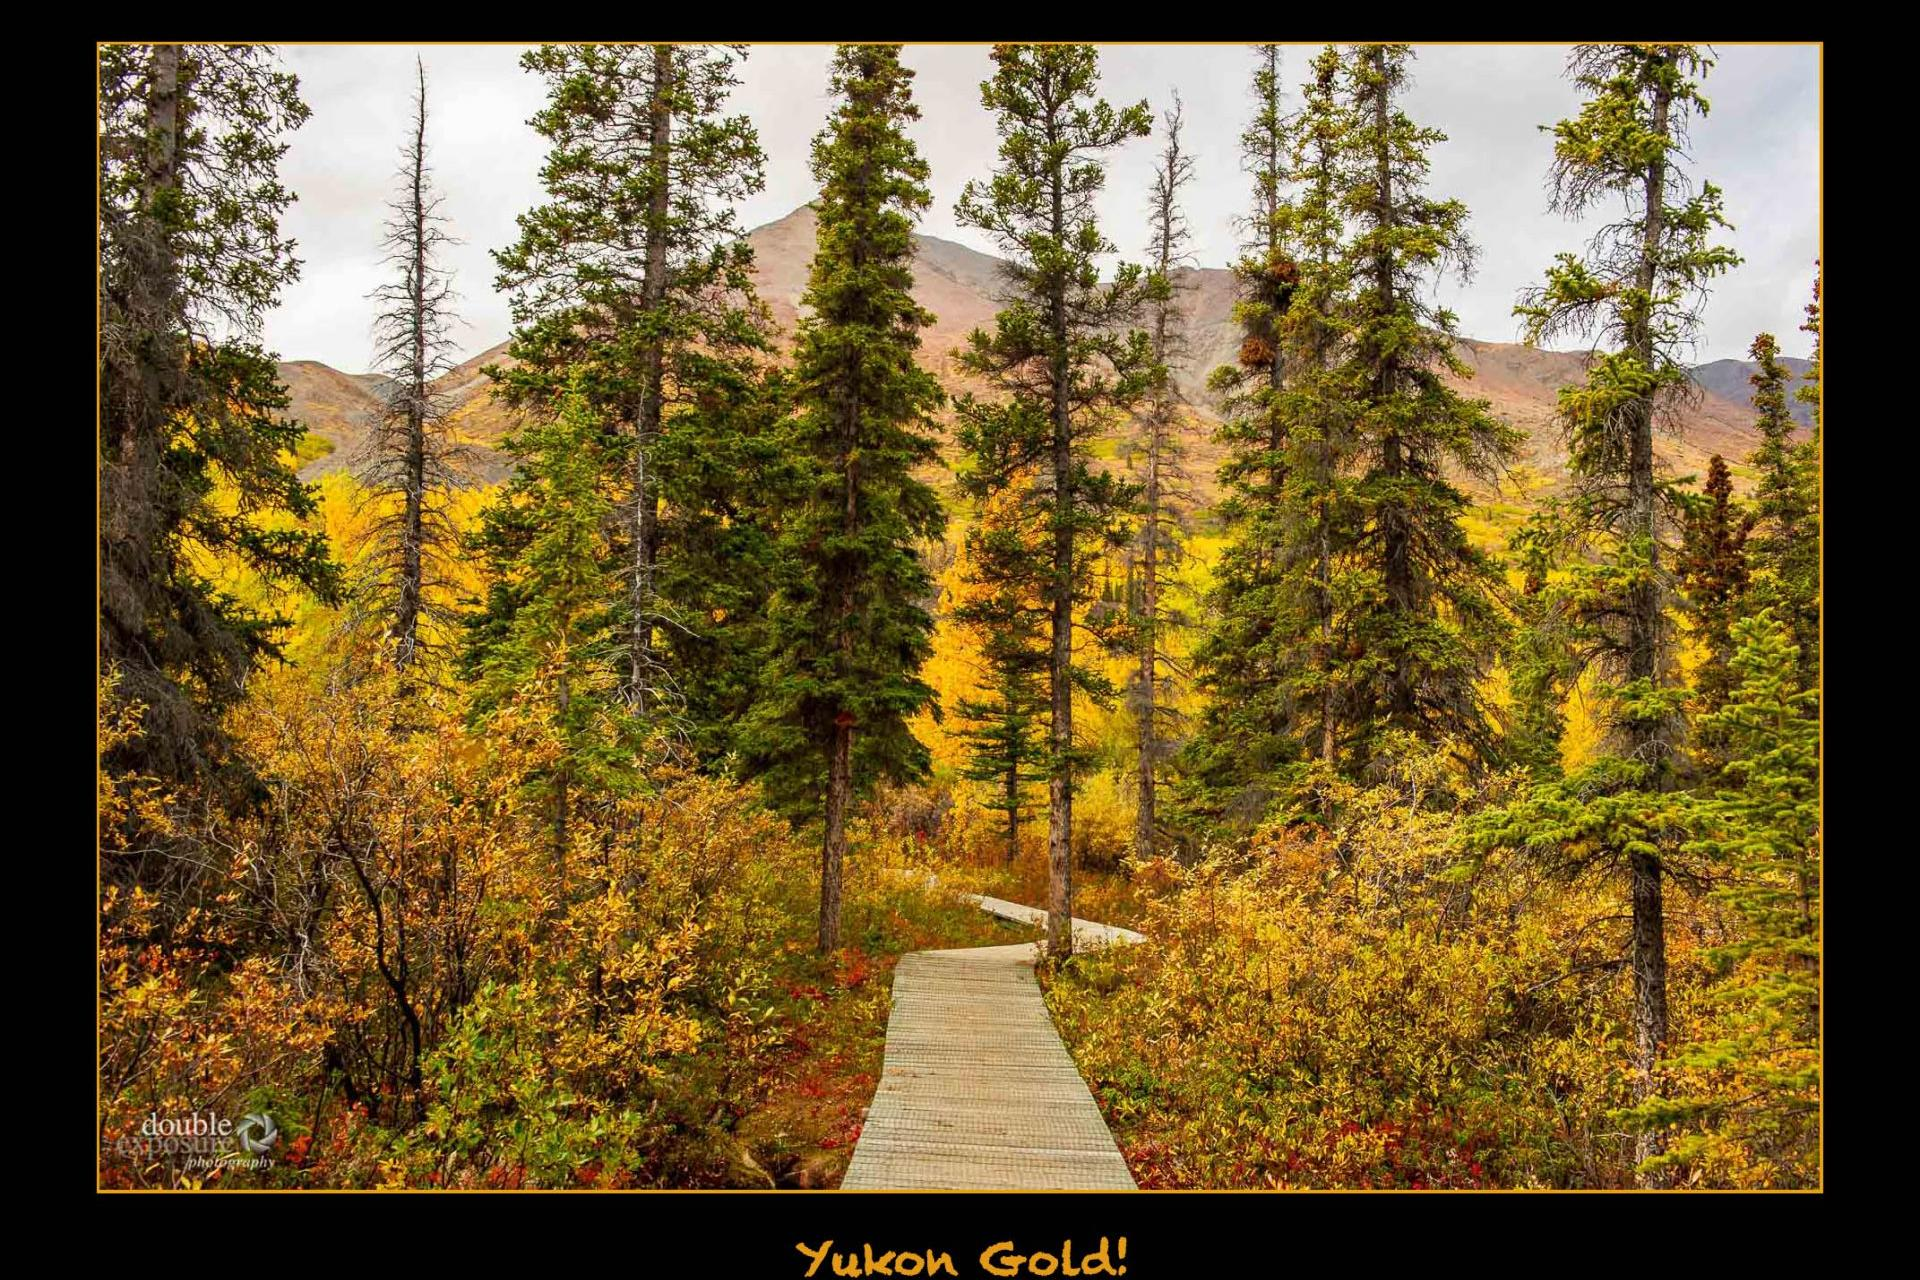 Yukon Gold!